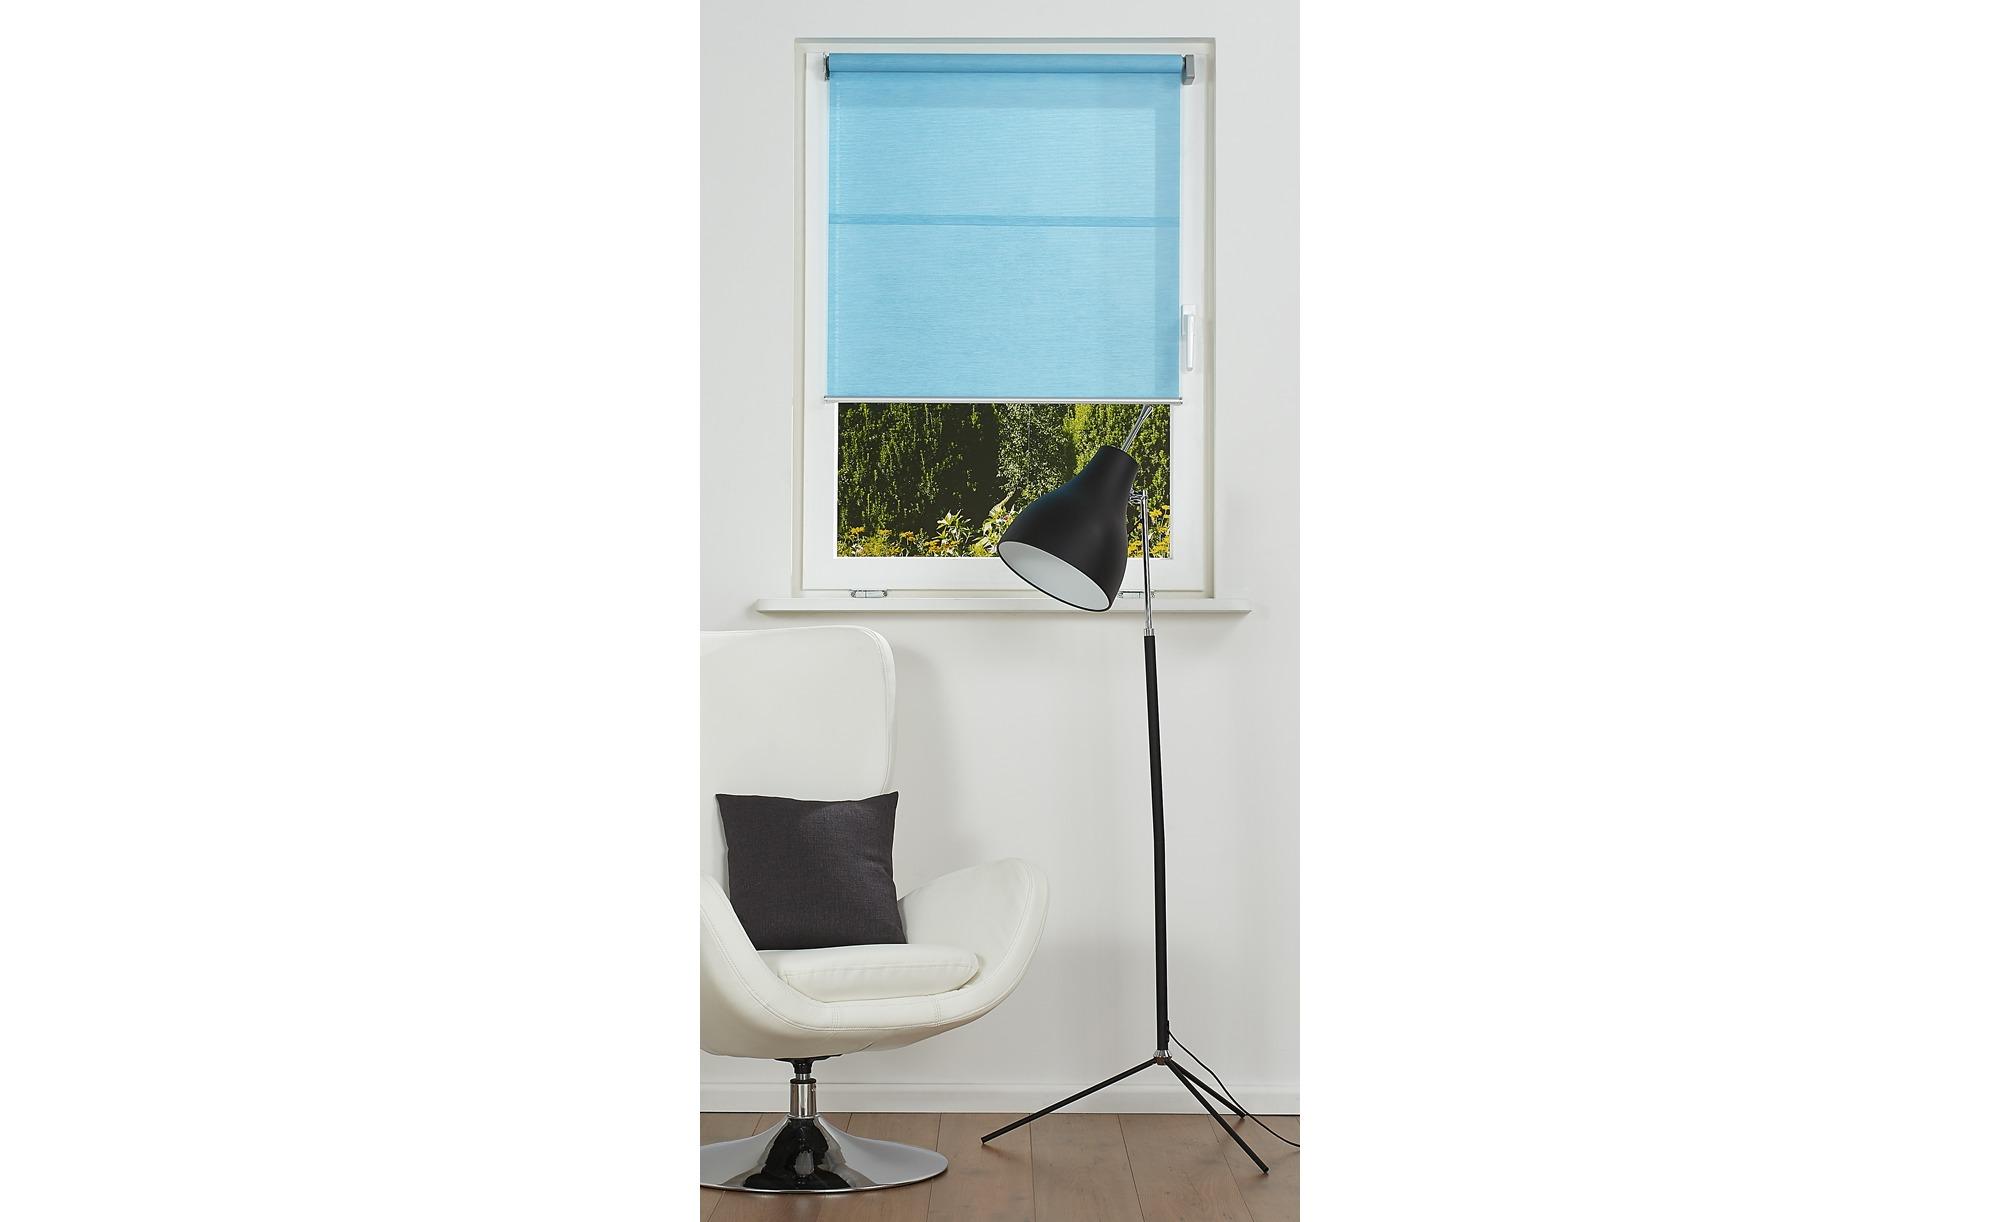 Rollo  Emma light ¦ blau ¦ 29% Polyester, 71% Papier ¦ Maße (cm): B: 75 Gardinen & Vorhänge > Rollos & Sonnenschutz > Rollos - Höffner